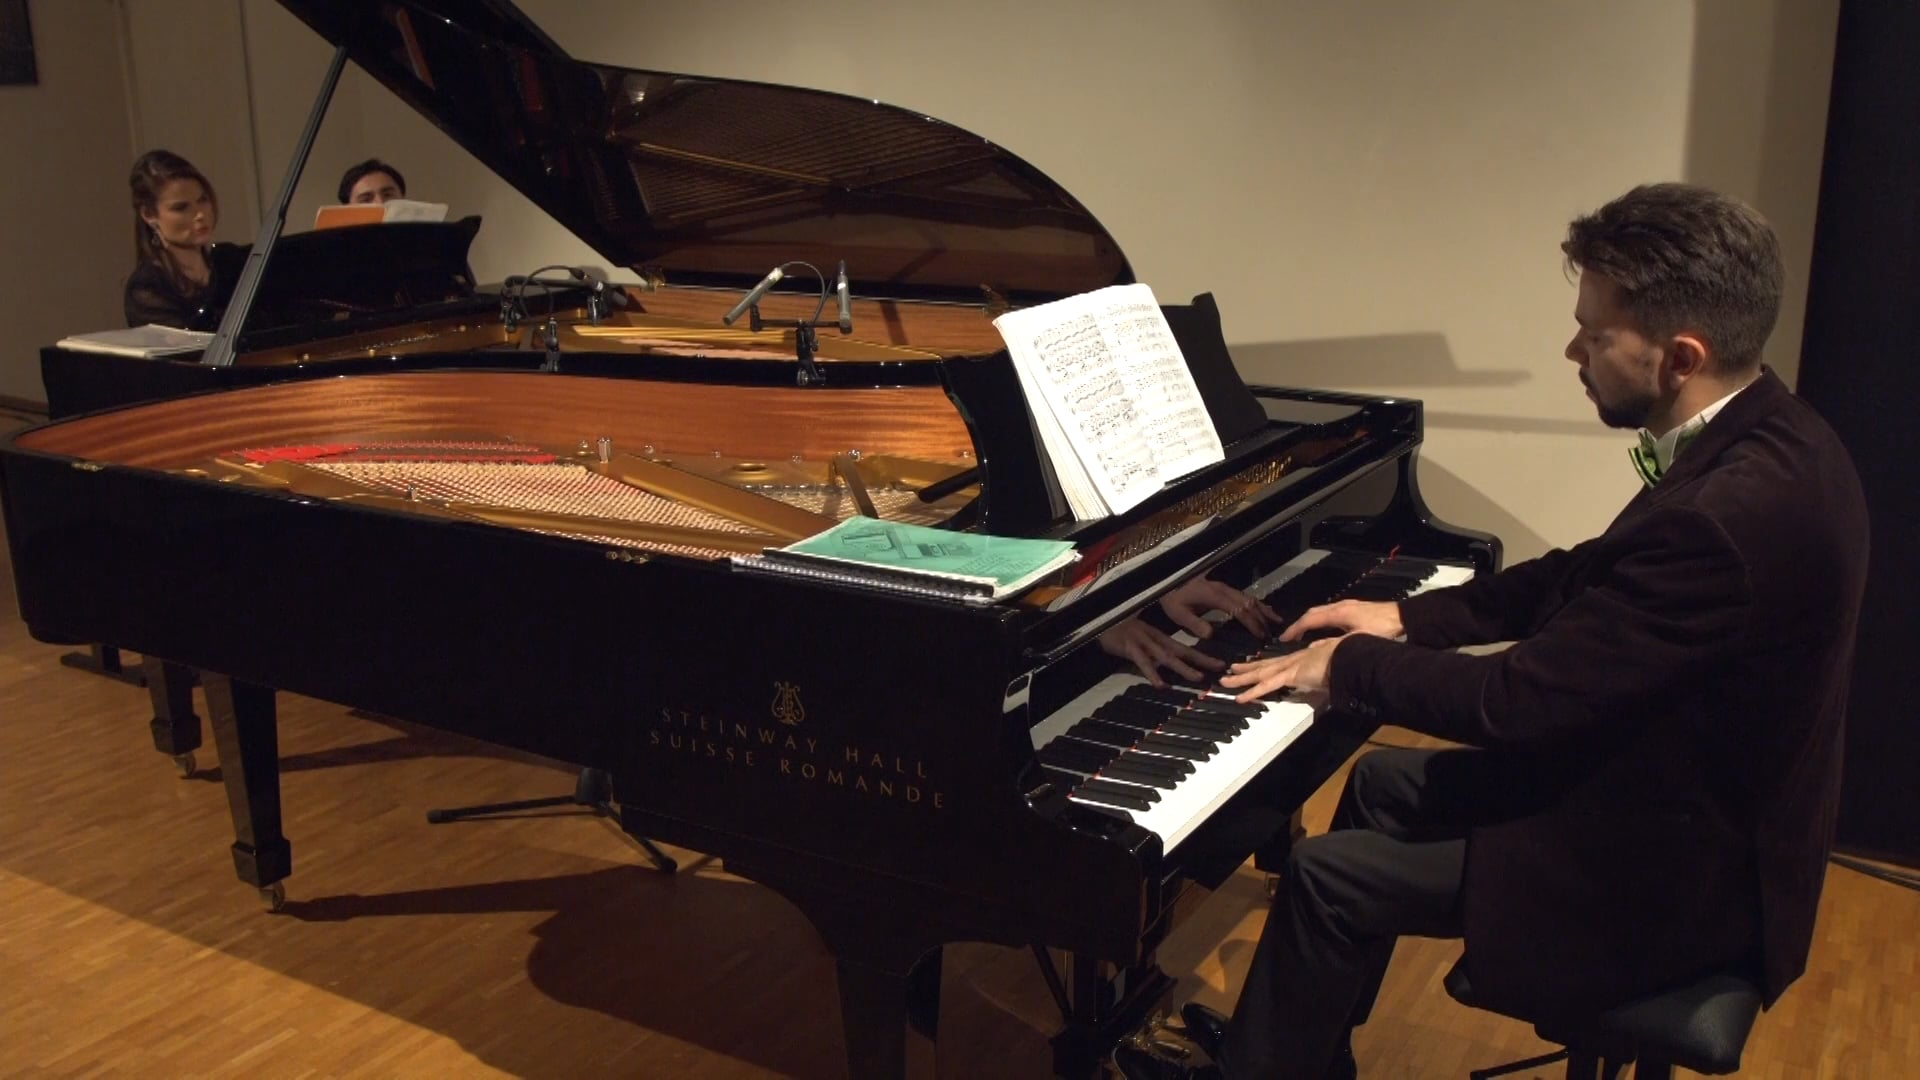 Piano Duo - Serguei Rachmaninov, Suite n° 1 (Fantaisie-tableaux), Op.5